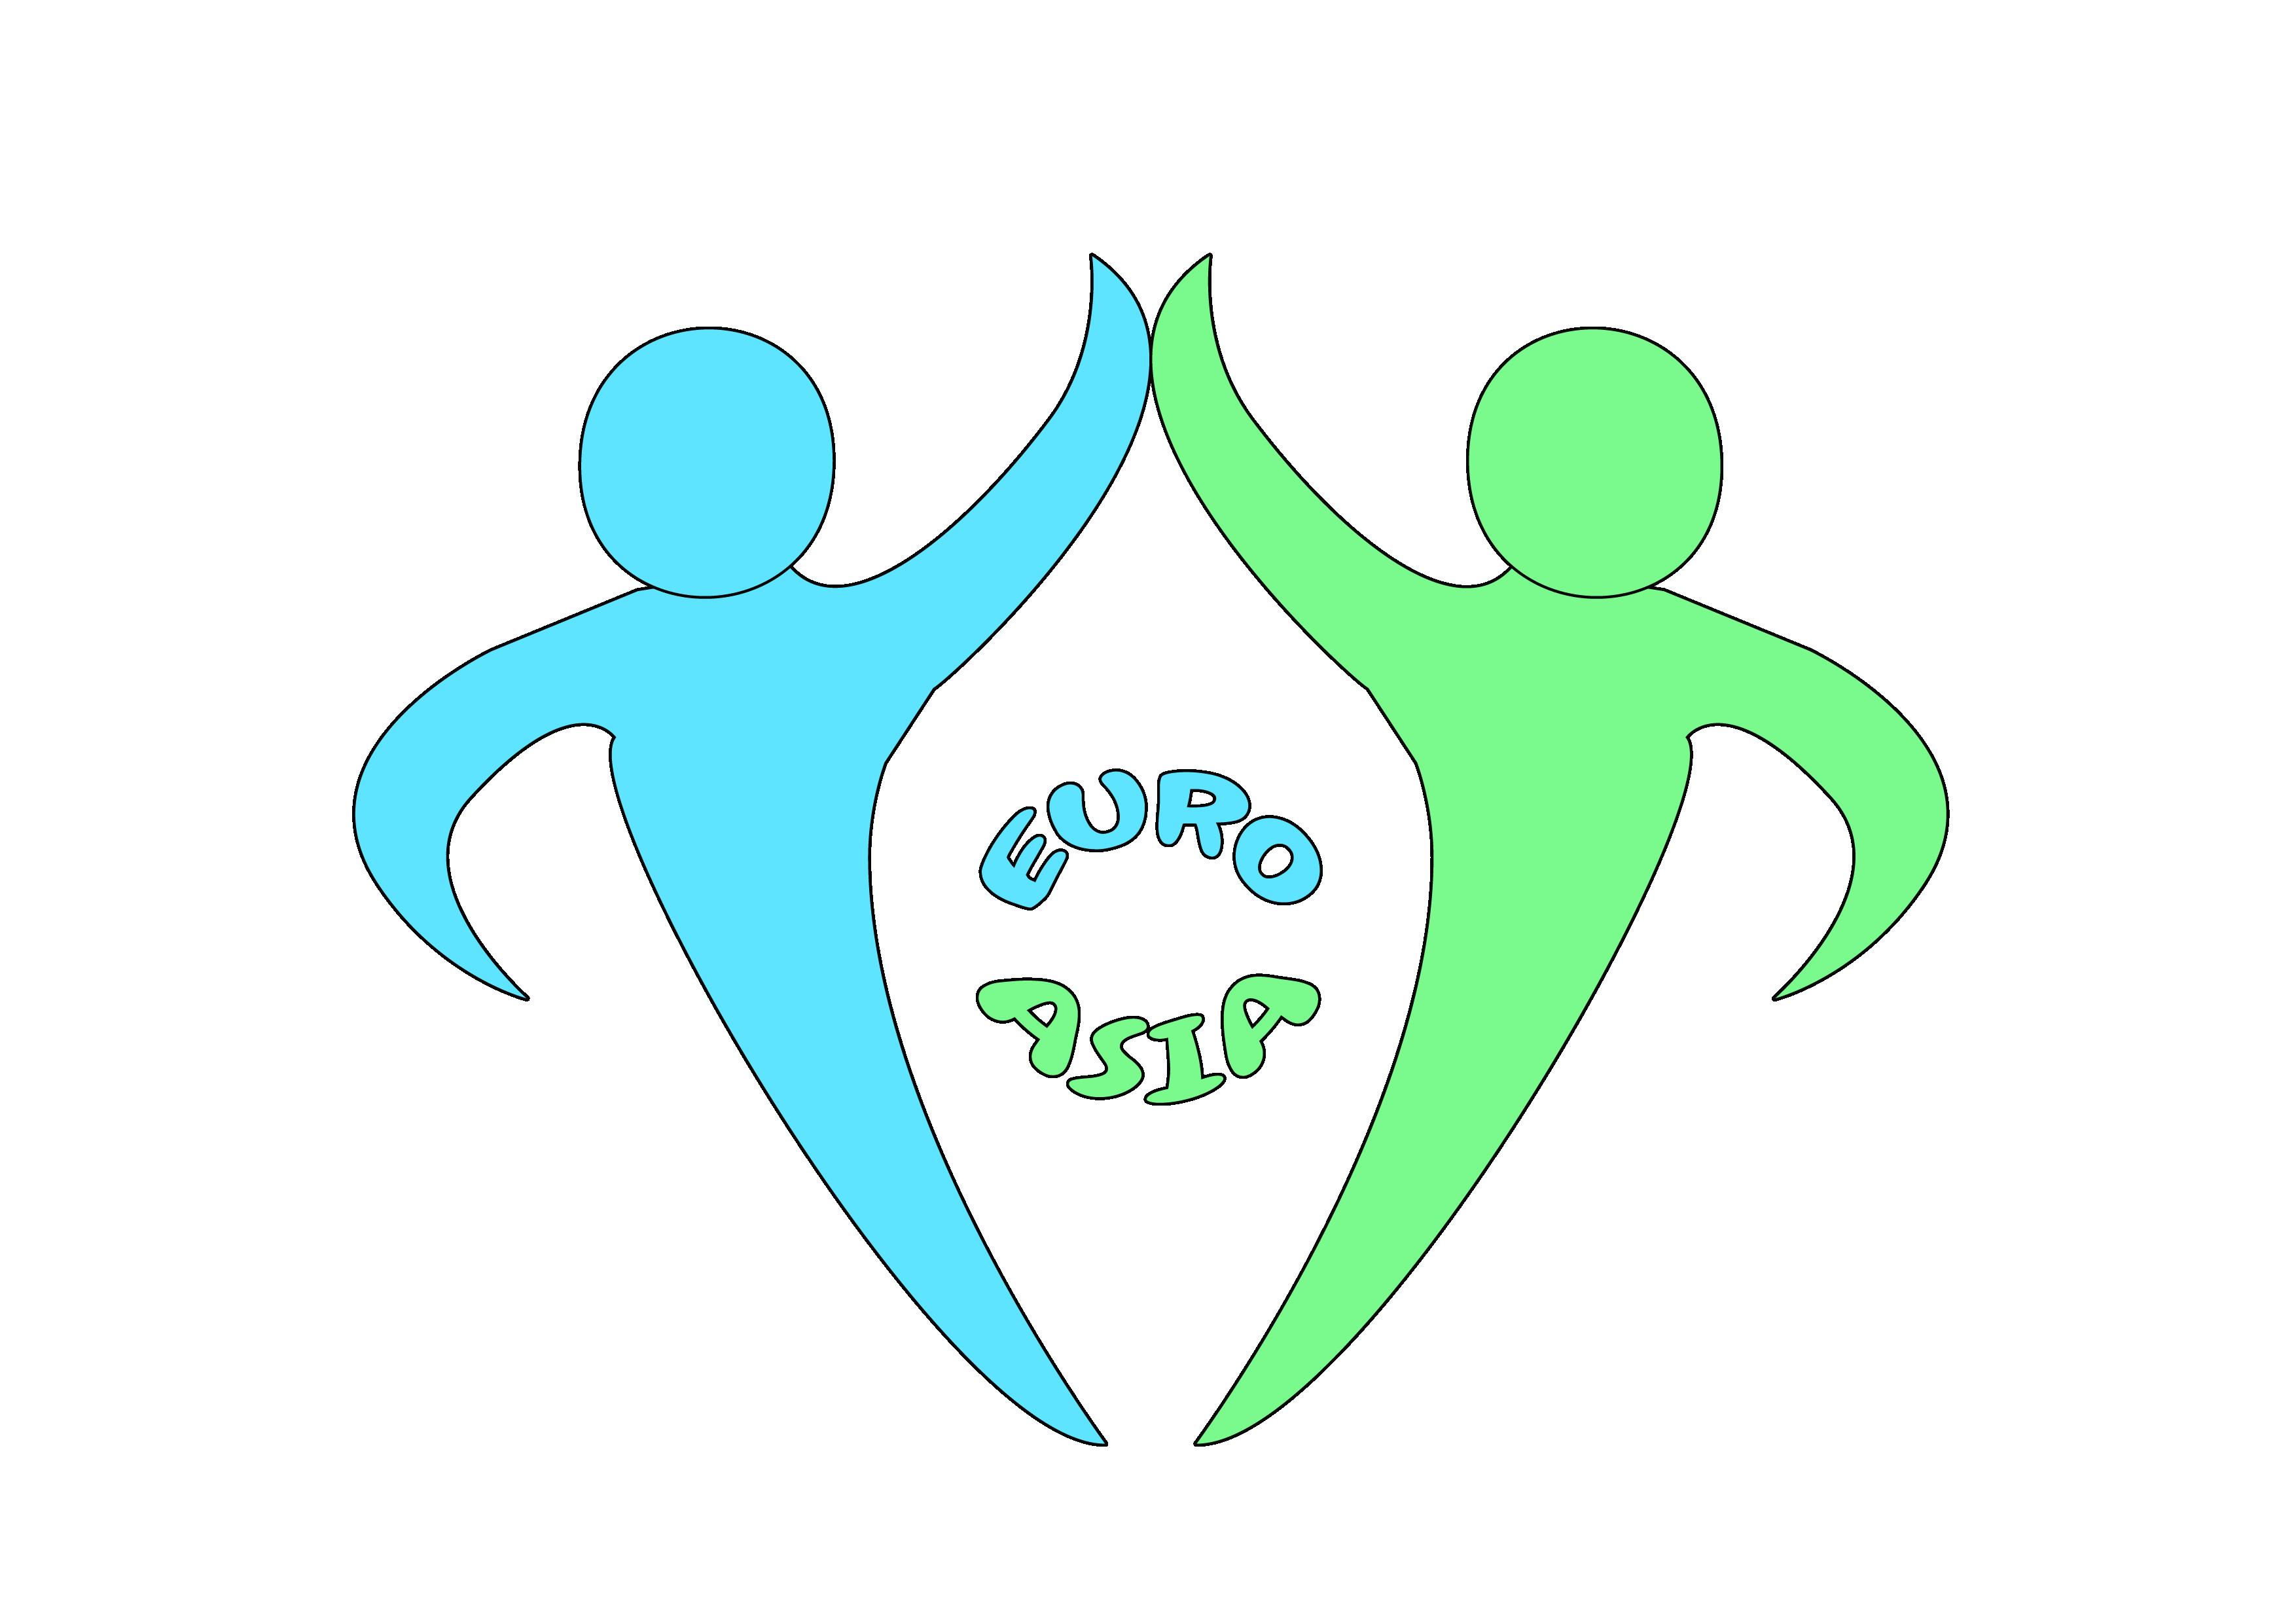 euroasia.mladiinfo.sk